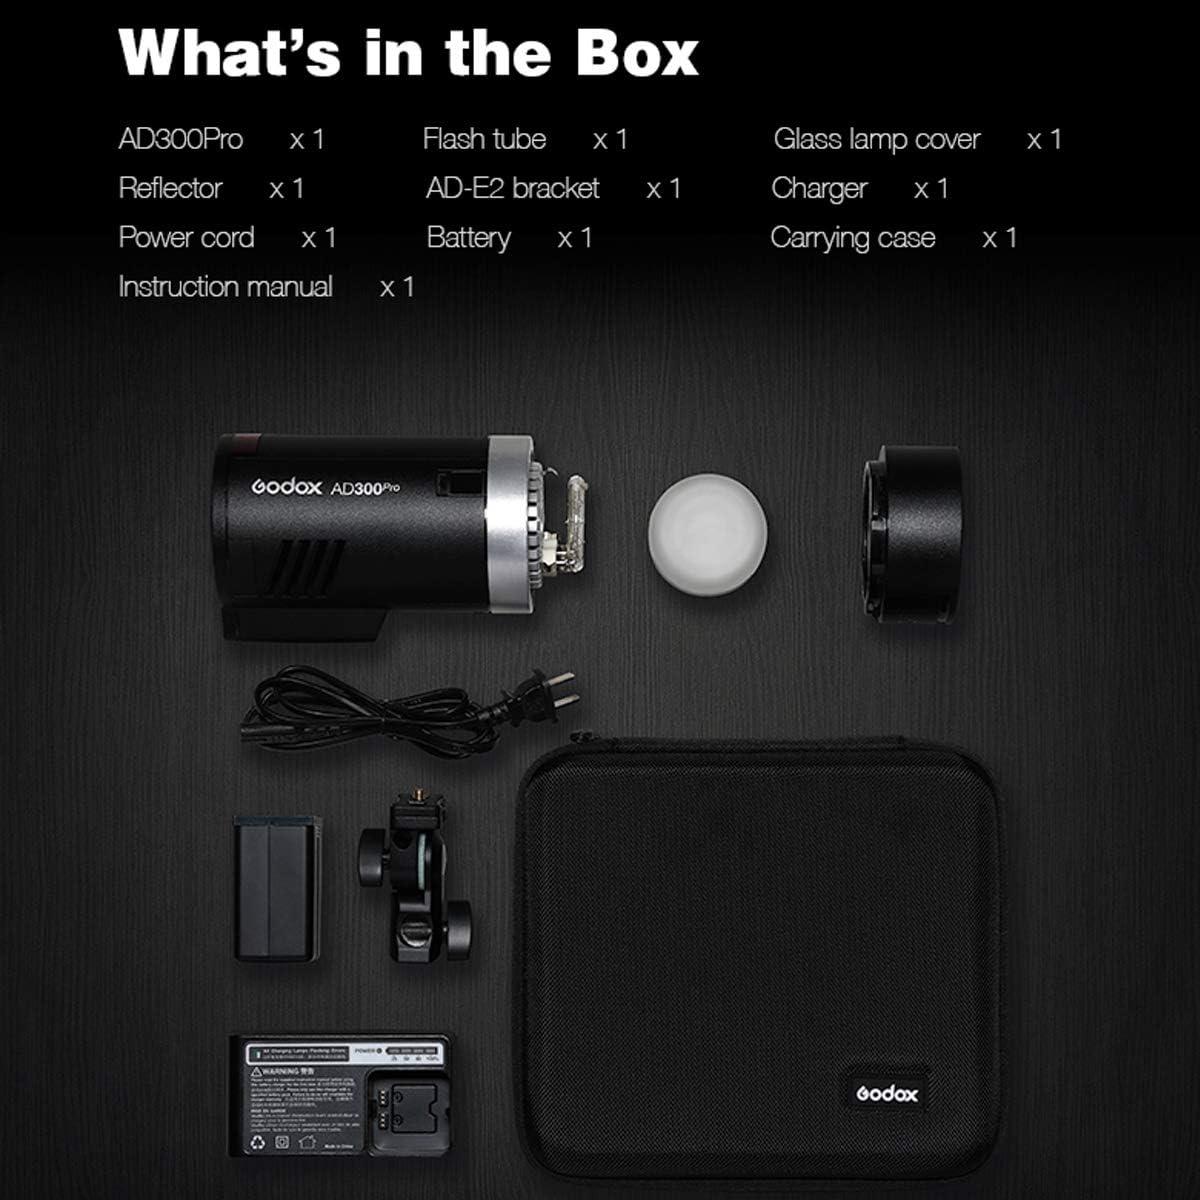 Fotostudio & Beleuchtung Zubehr 2600mAh Lithium-Batterie 0,01-1 ...